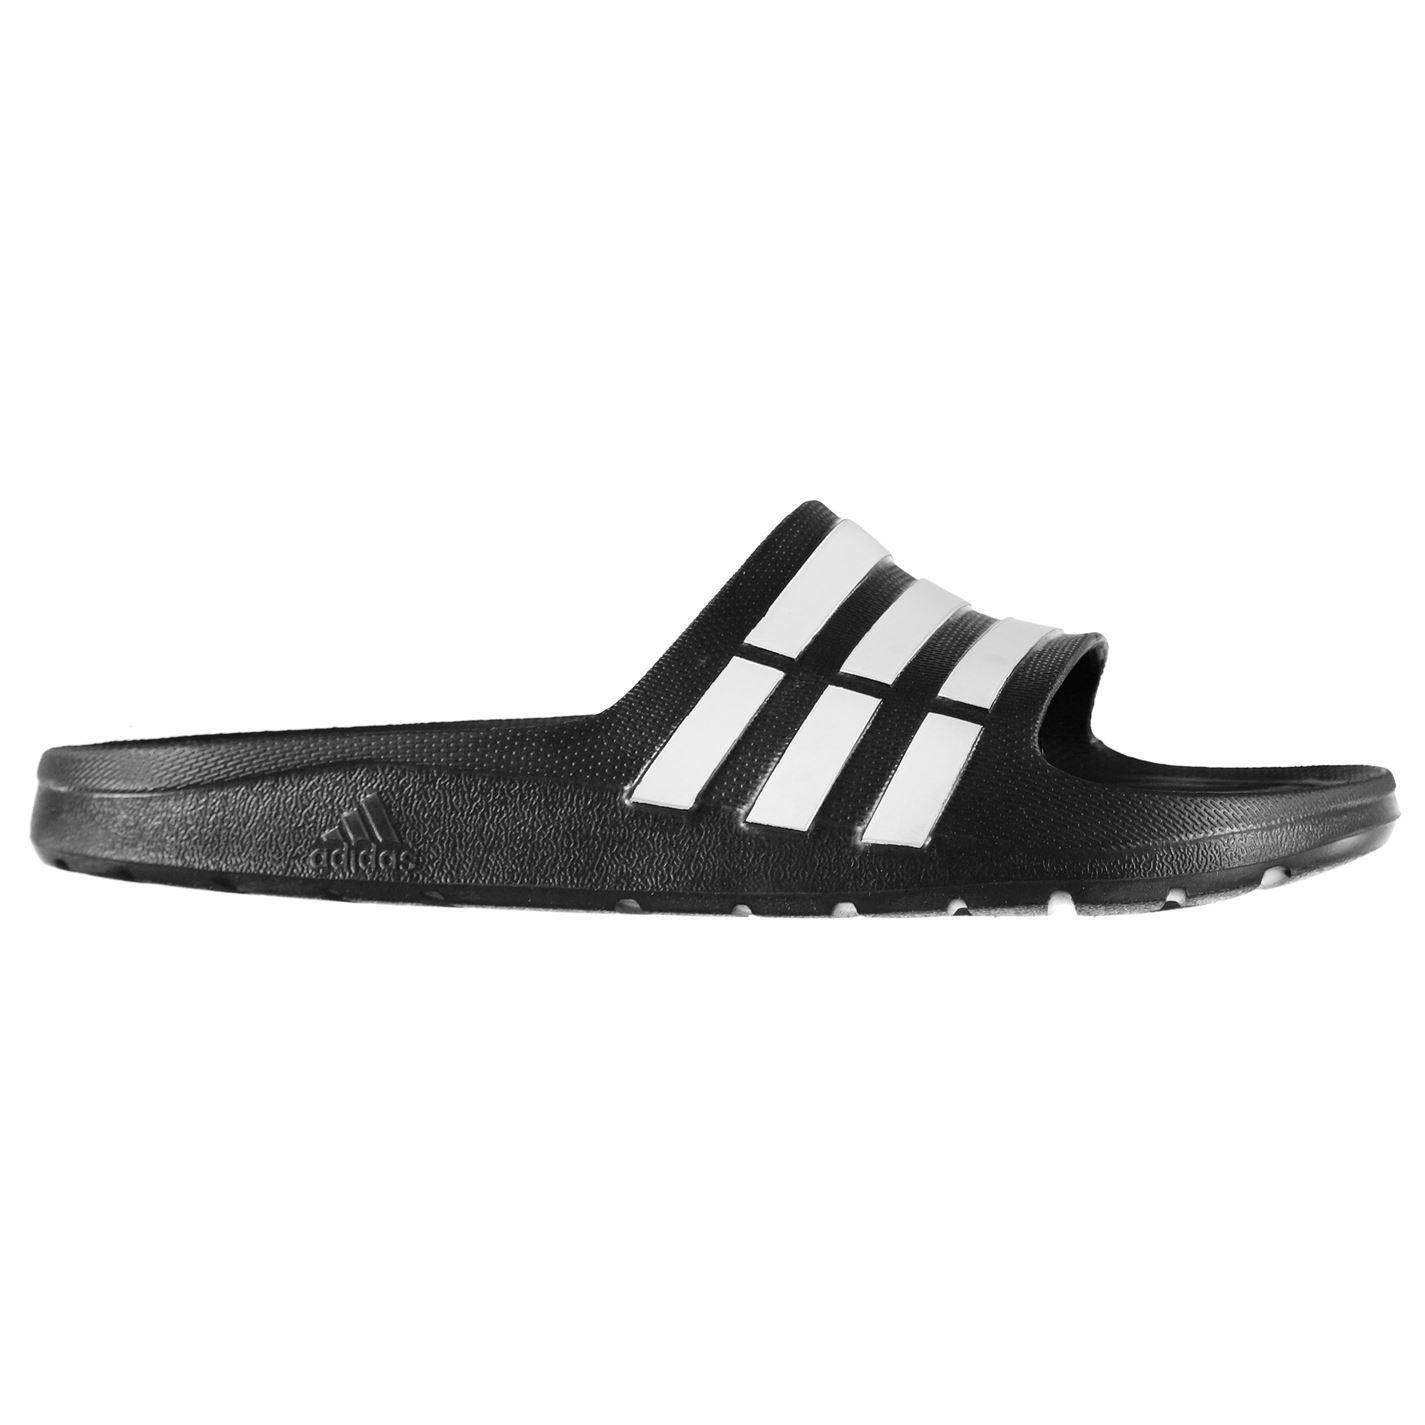 898fd57351dae Kids Sliders Pool Strap Ebay Junior Stripe Duramo Adidas Shoes 7ApWw1q41c